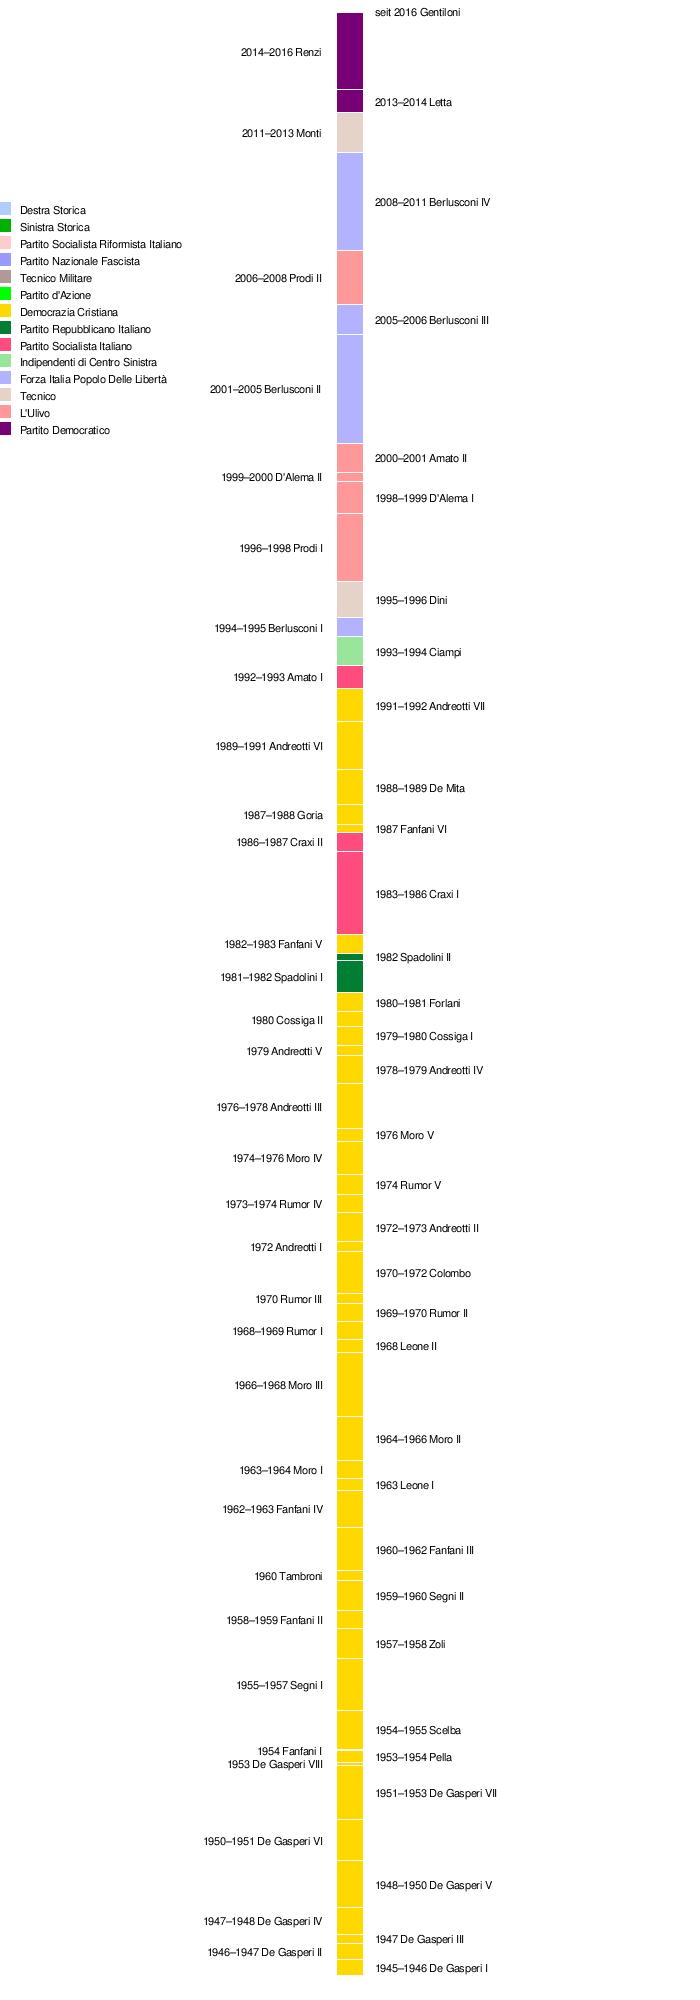 Vorlage:Zeitleiste Ministerpräsidenten Italiens seit 1946 – Wikipedia